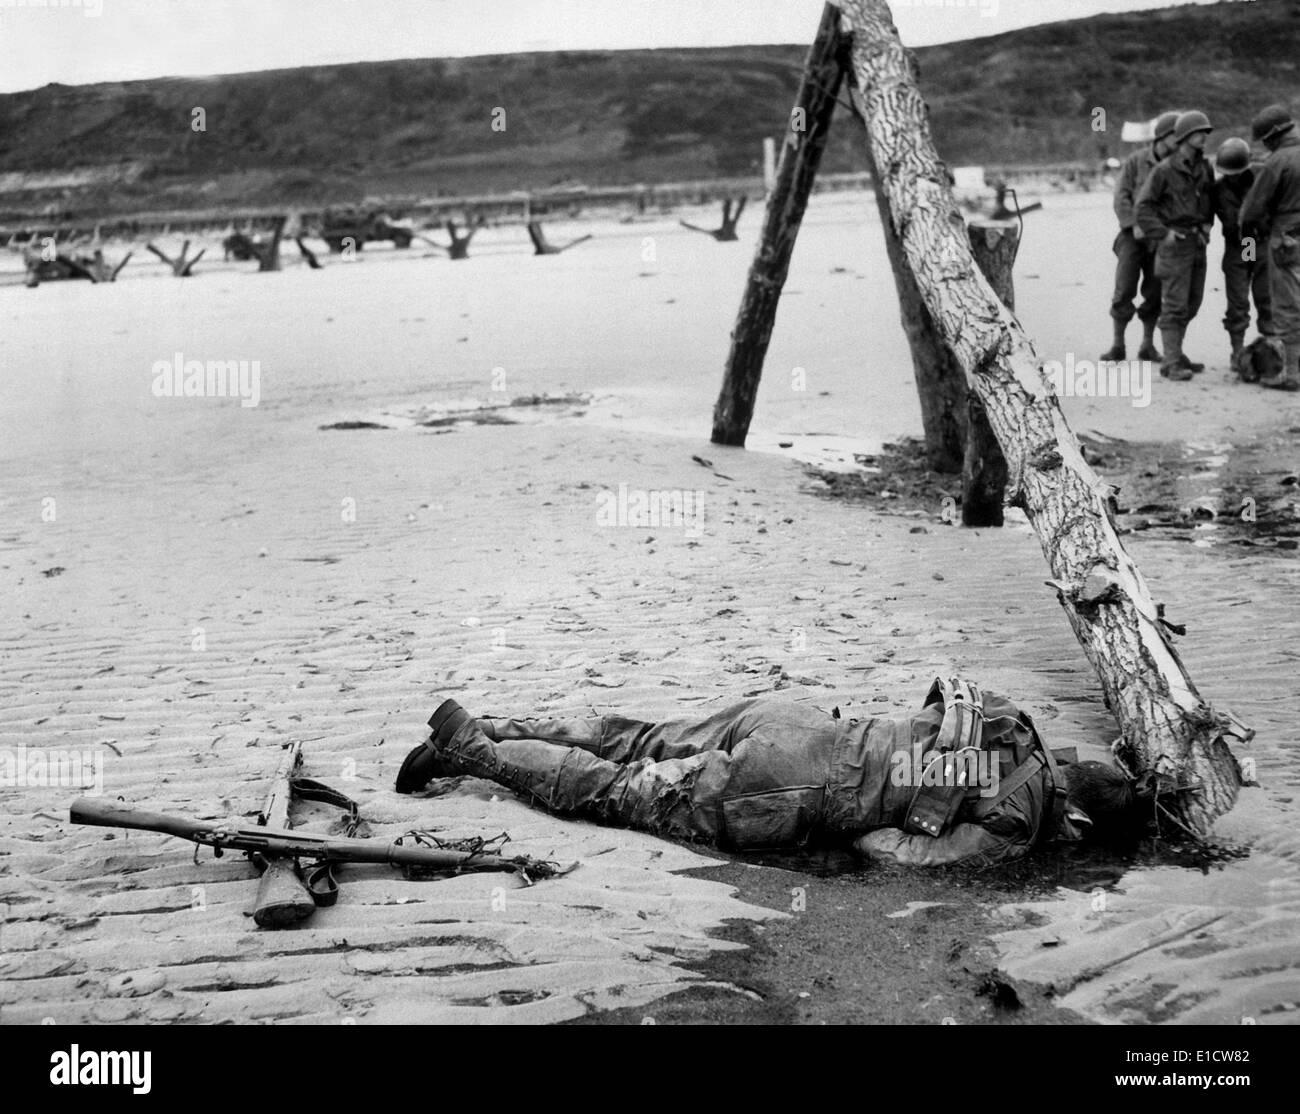 Dead U.S. soldier on Omaha beach on D-Day, June 6, 1944. Crossed ...